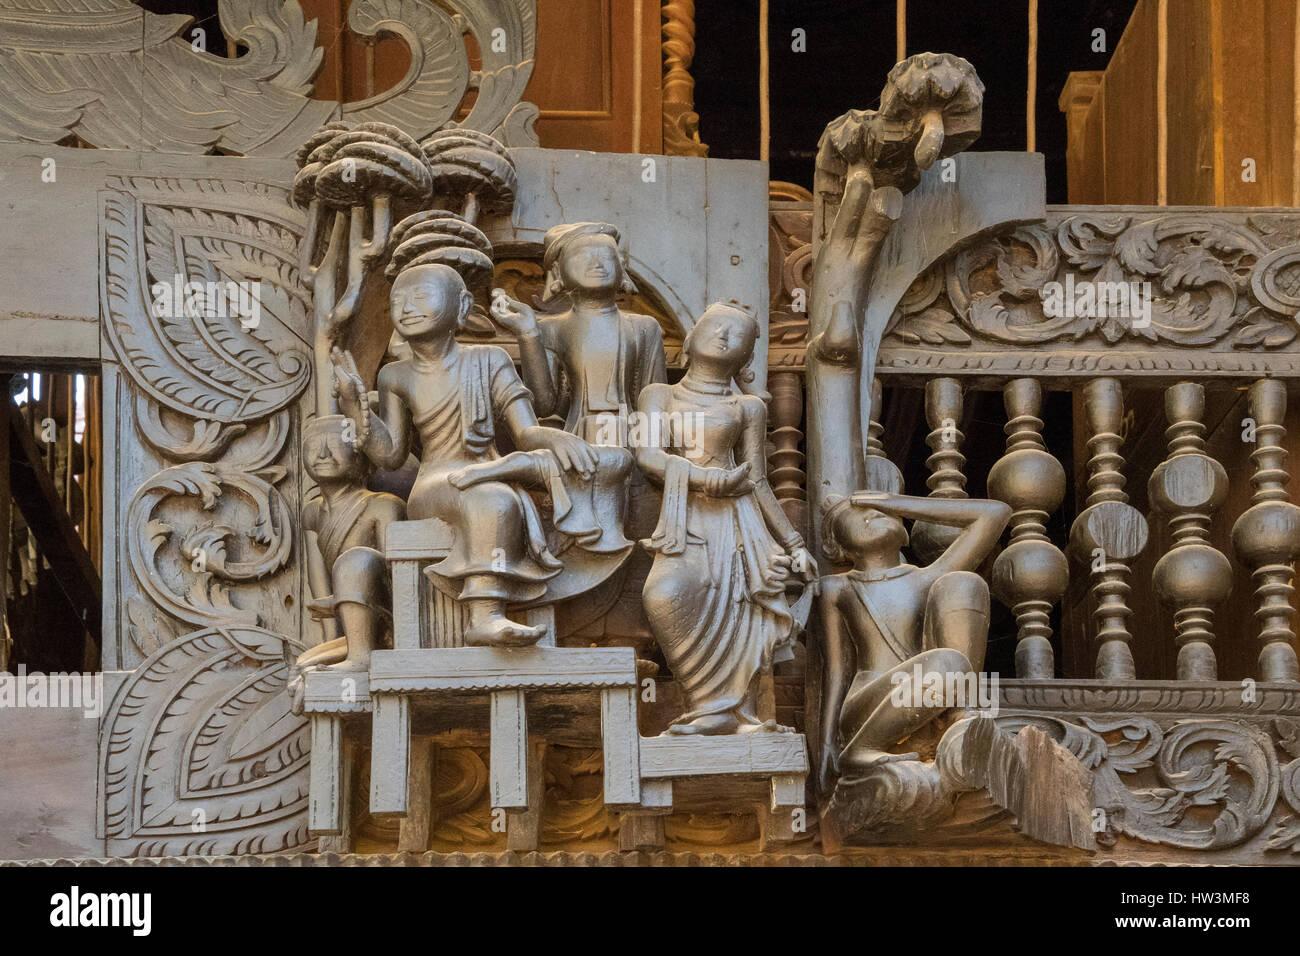 Teak Carving on Yoke Sone Kyaung Monastery, Sale, Myanmar Temptation with Guile - Stock Image